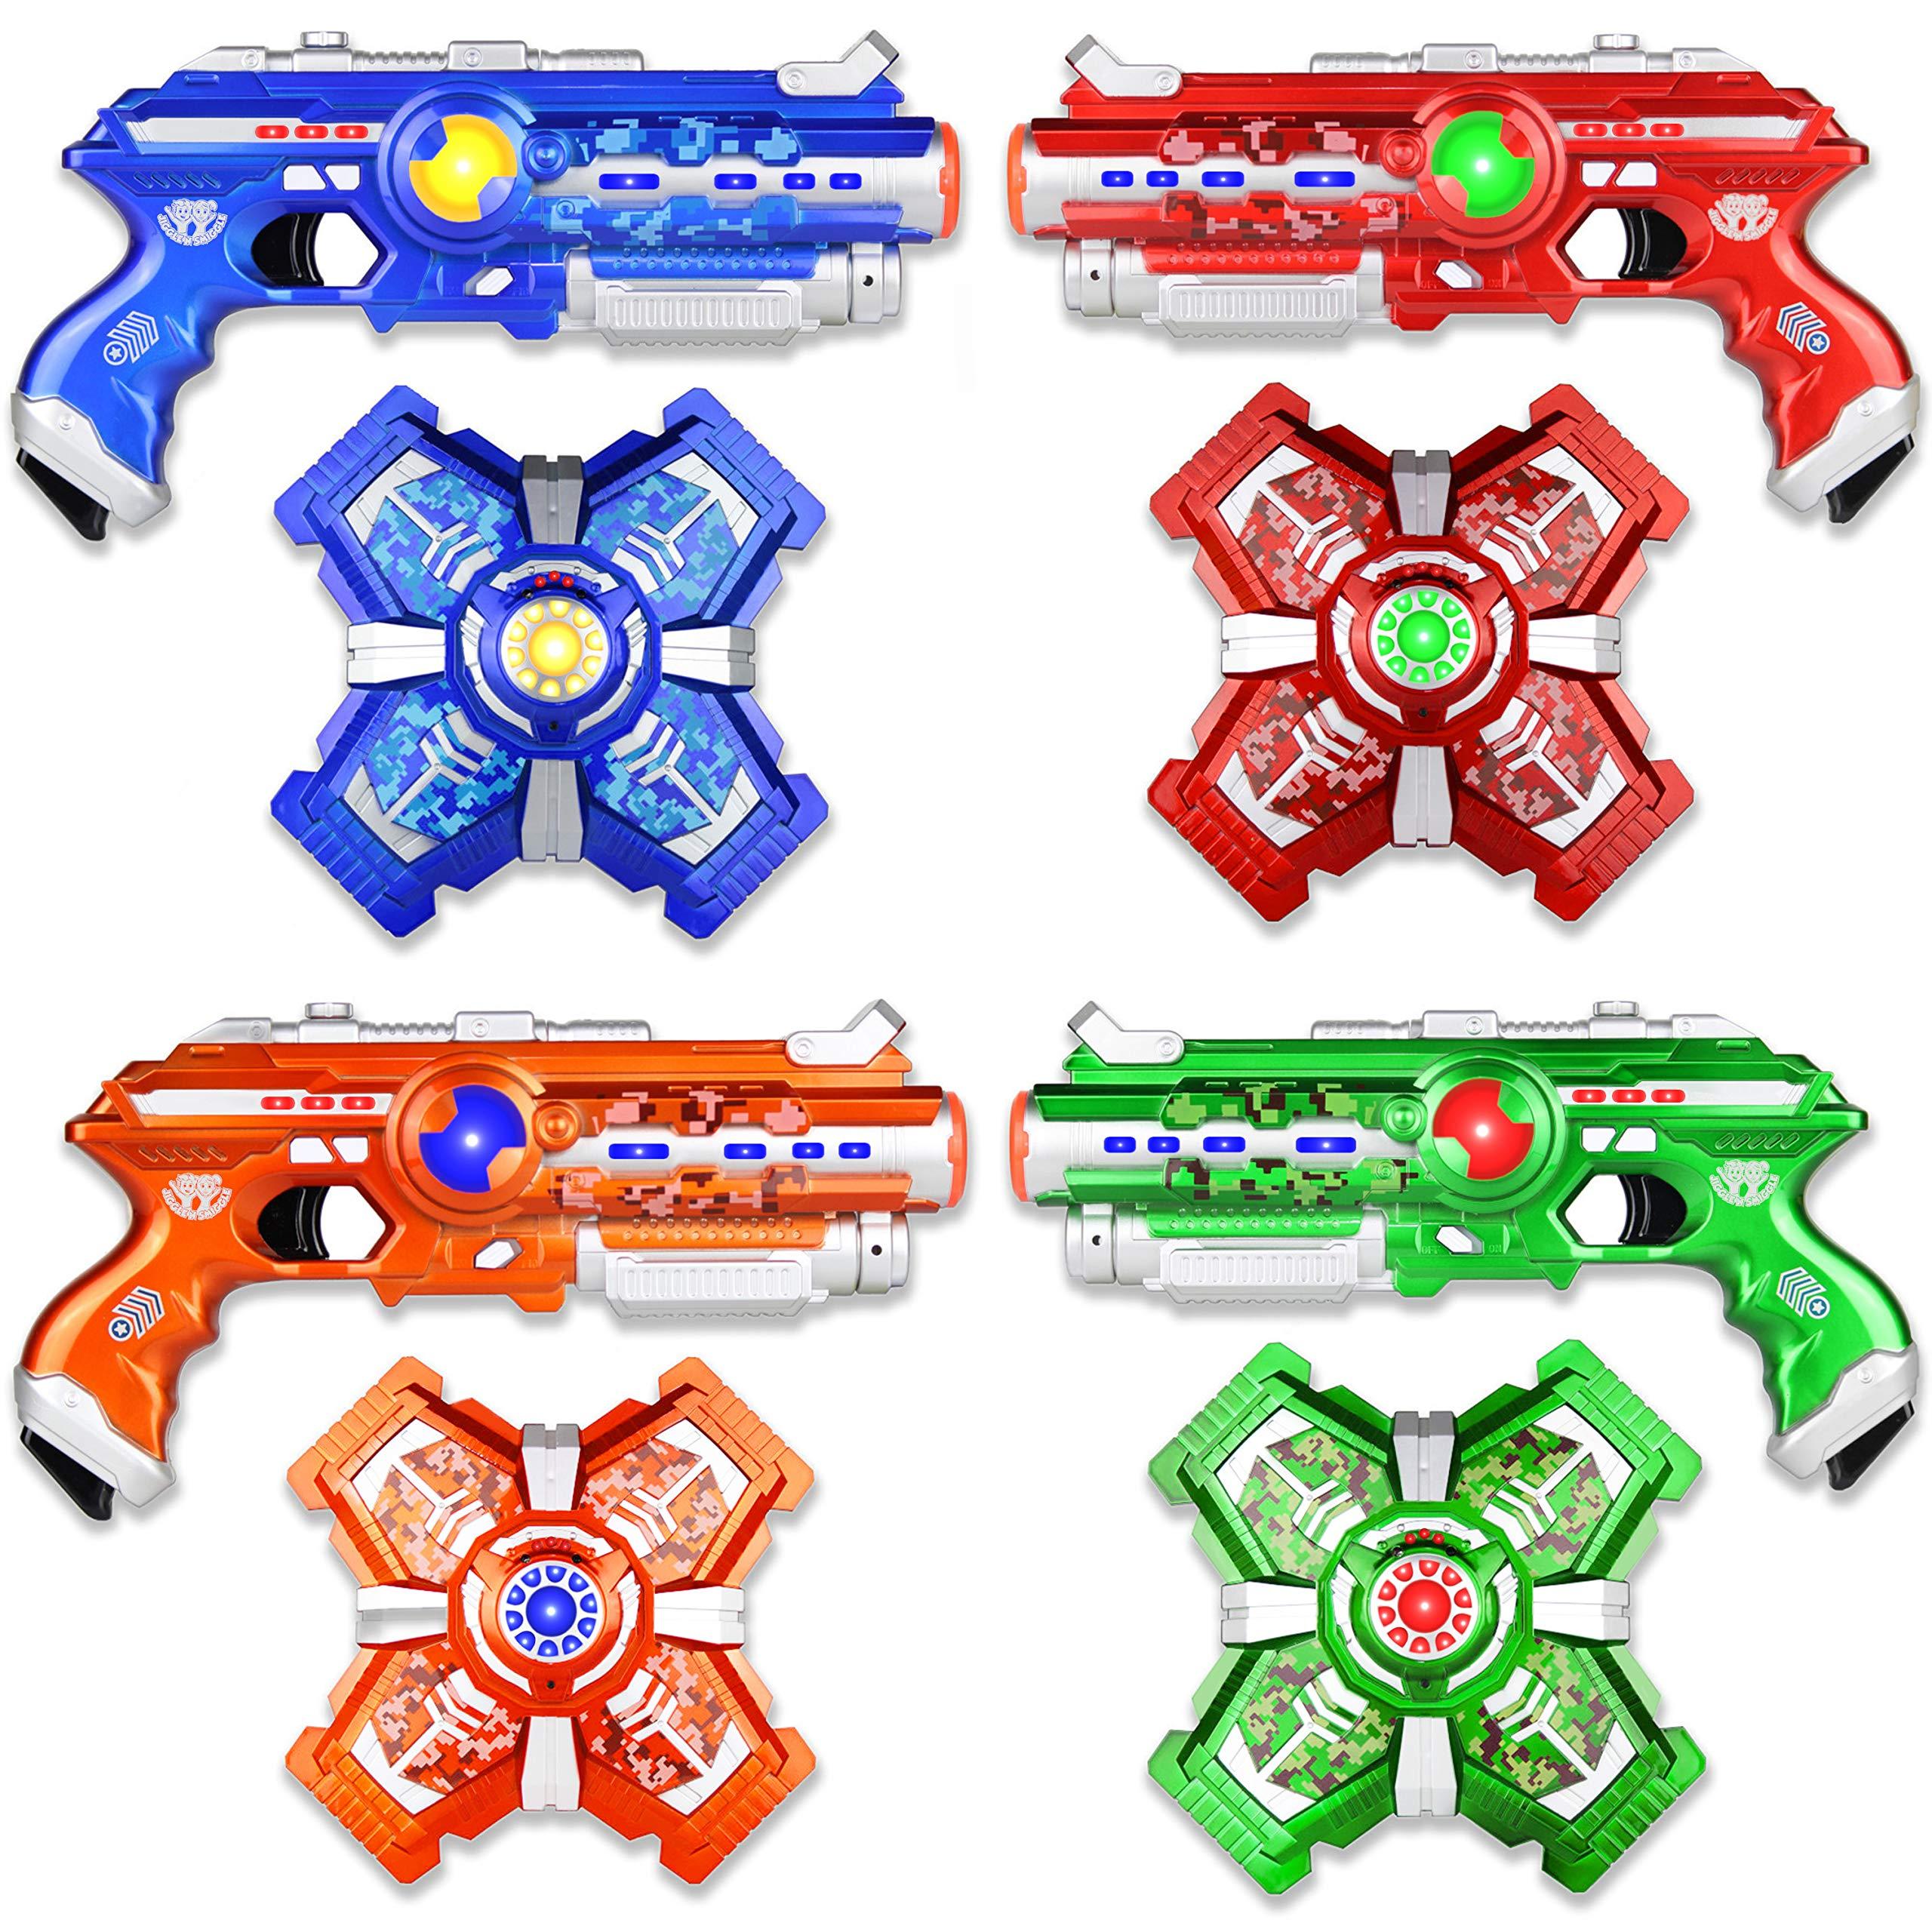 Jiggle N Smiggle Laser Tag Sets with Gun and Vest - Futuristic Lazer Tag Gun Set with Adjustable Vests for Indoor & Outdoor Games - Laser Tag for Kids & Adults - Set of 4